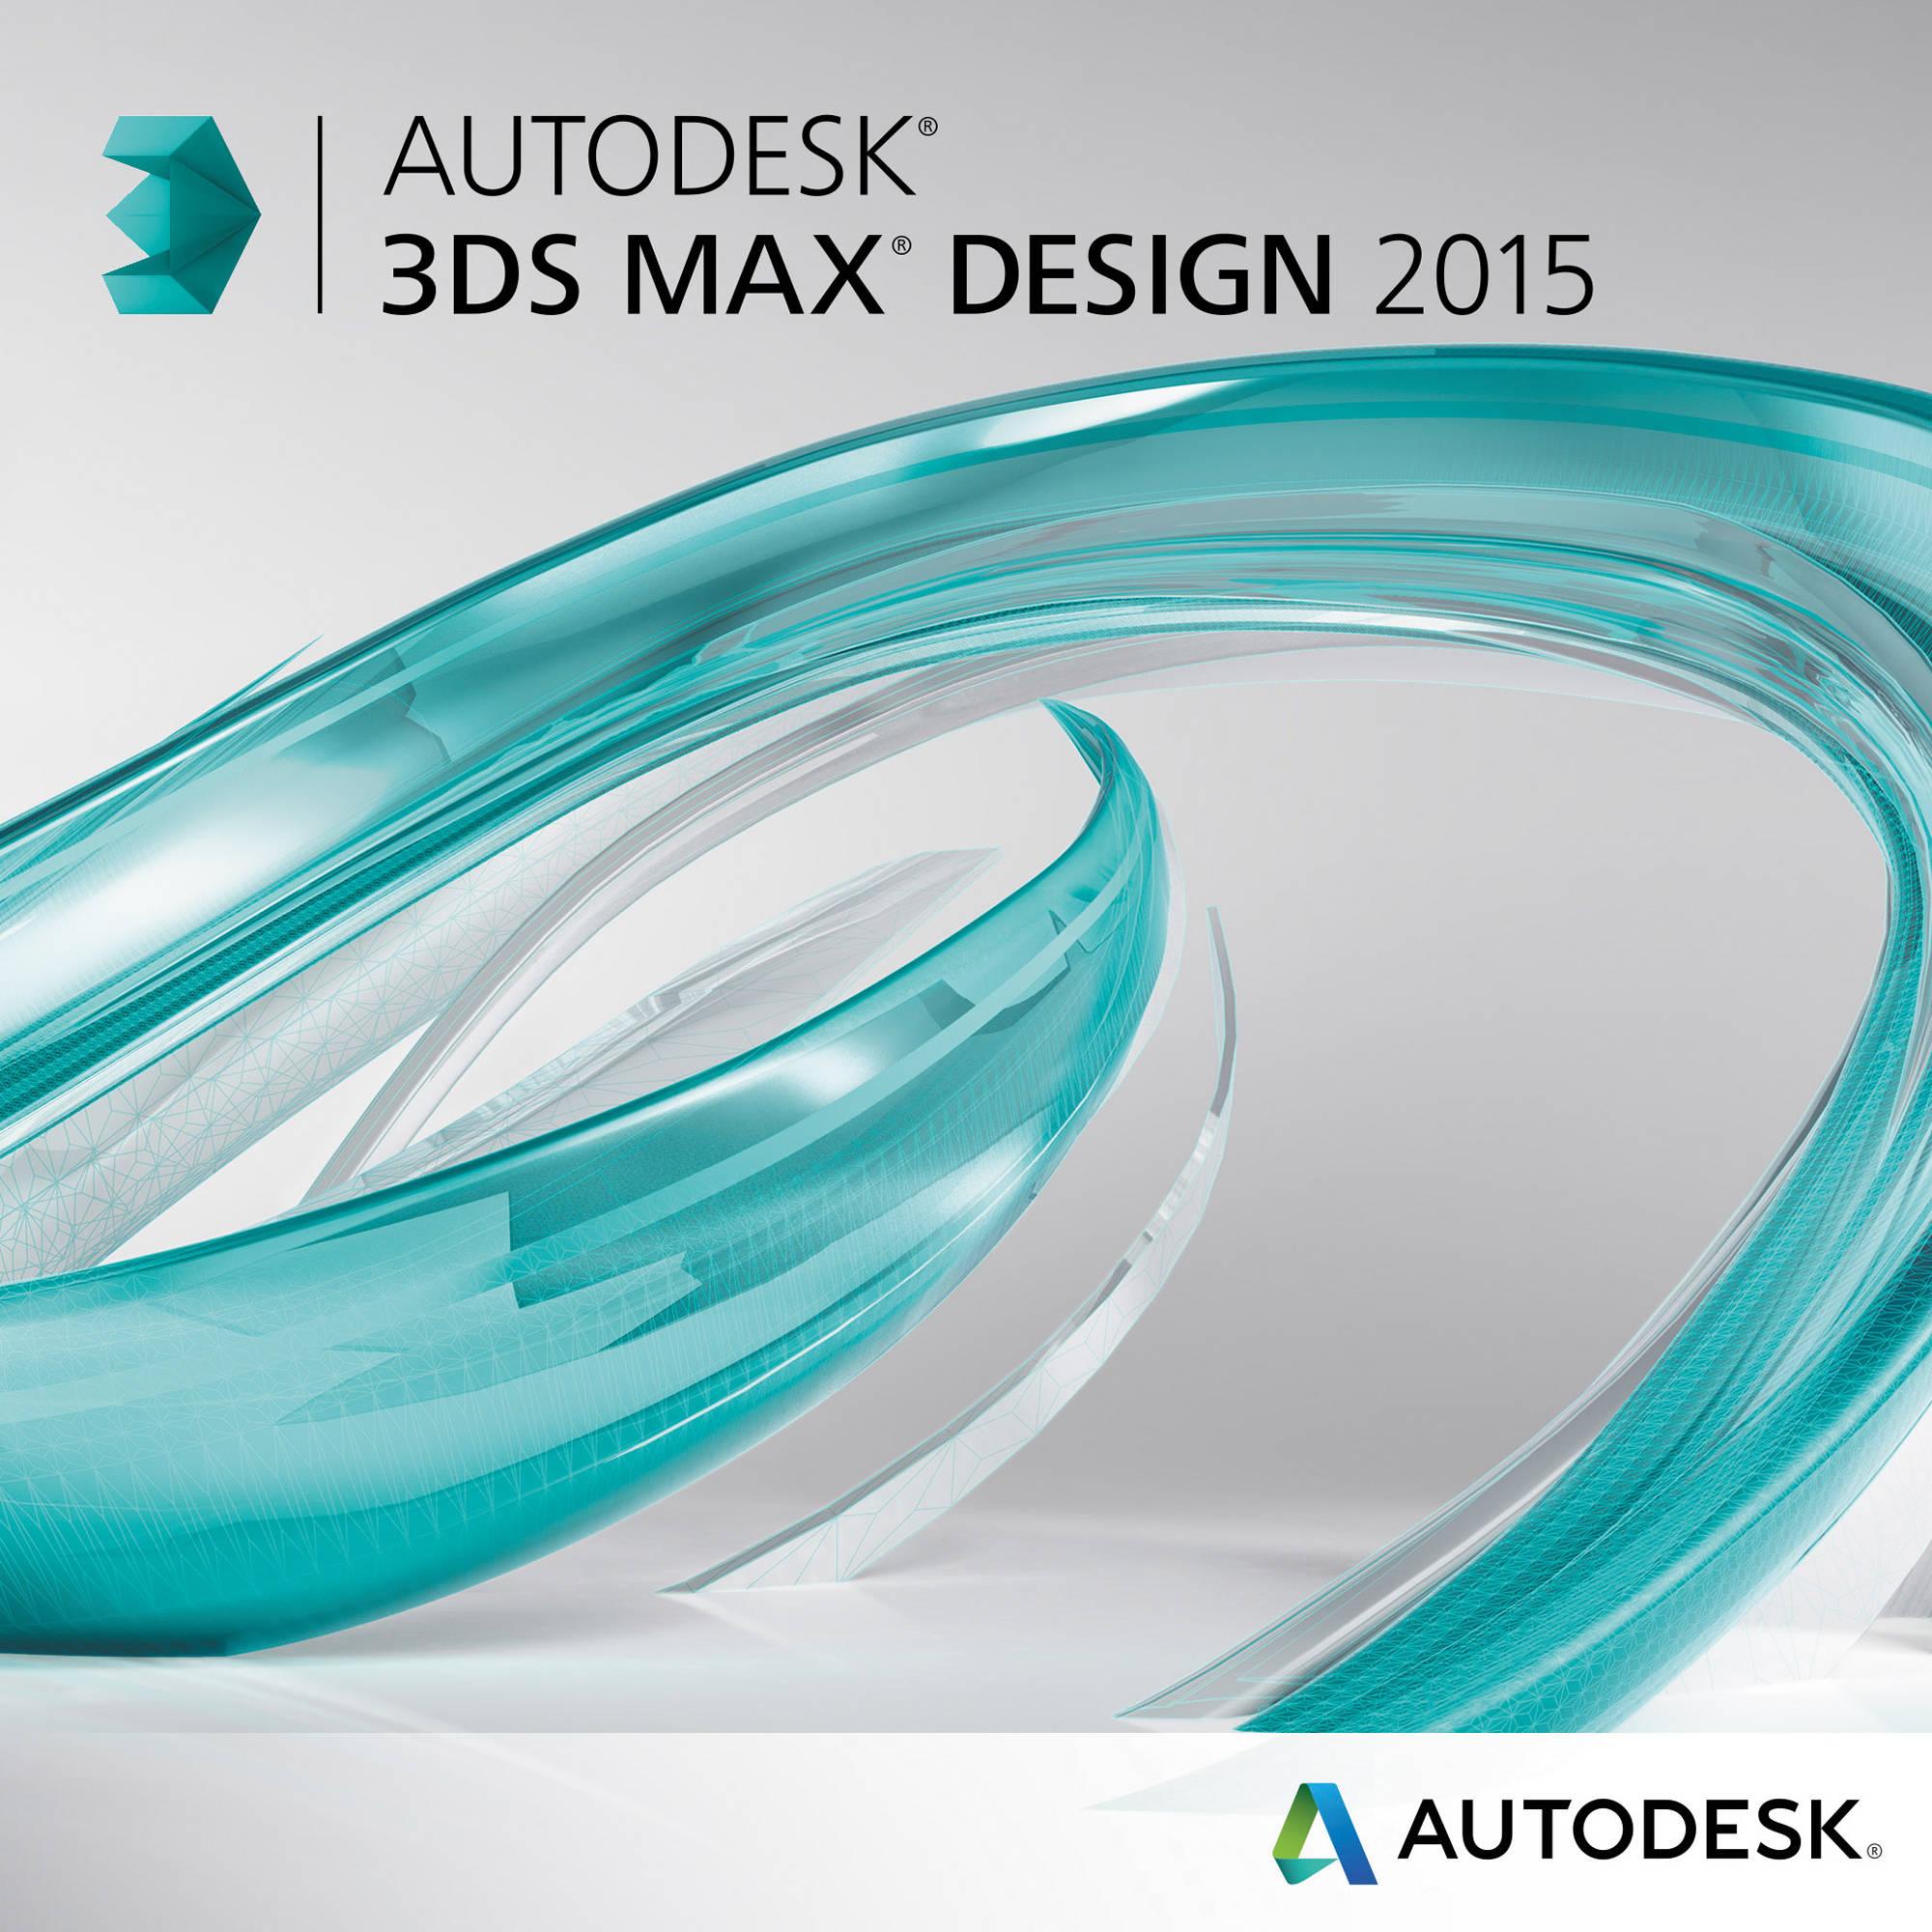 Best Free 3d Home Design Software 2015: Autodesk 3ds Max Design 2015 (Download) 495G1-WWR111-1001 B&H